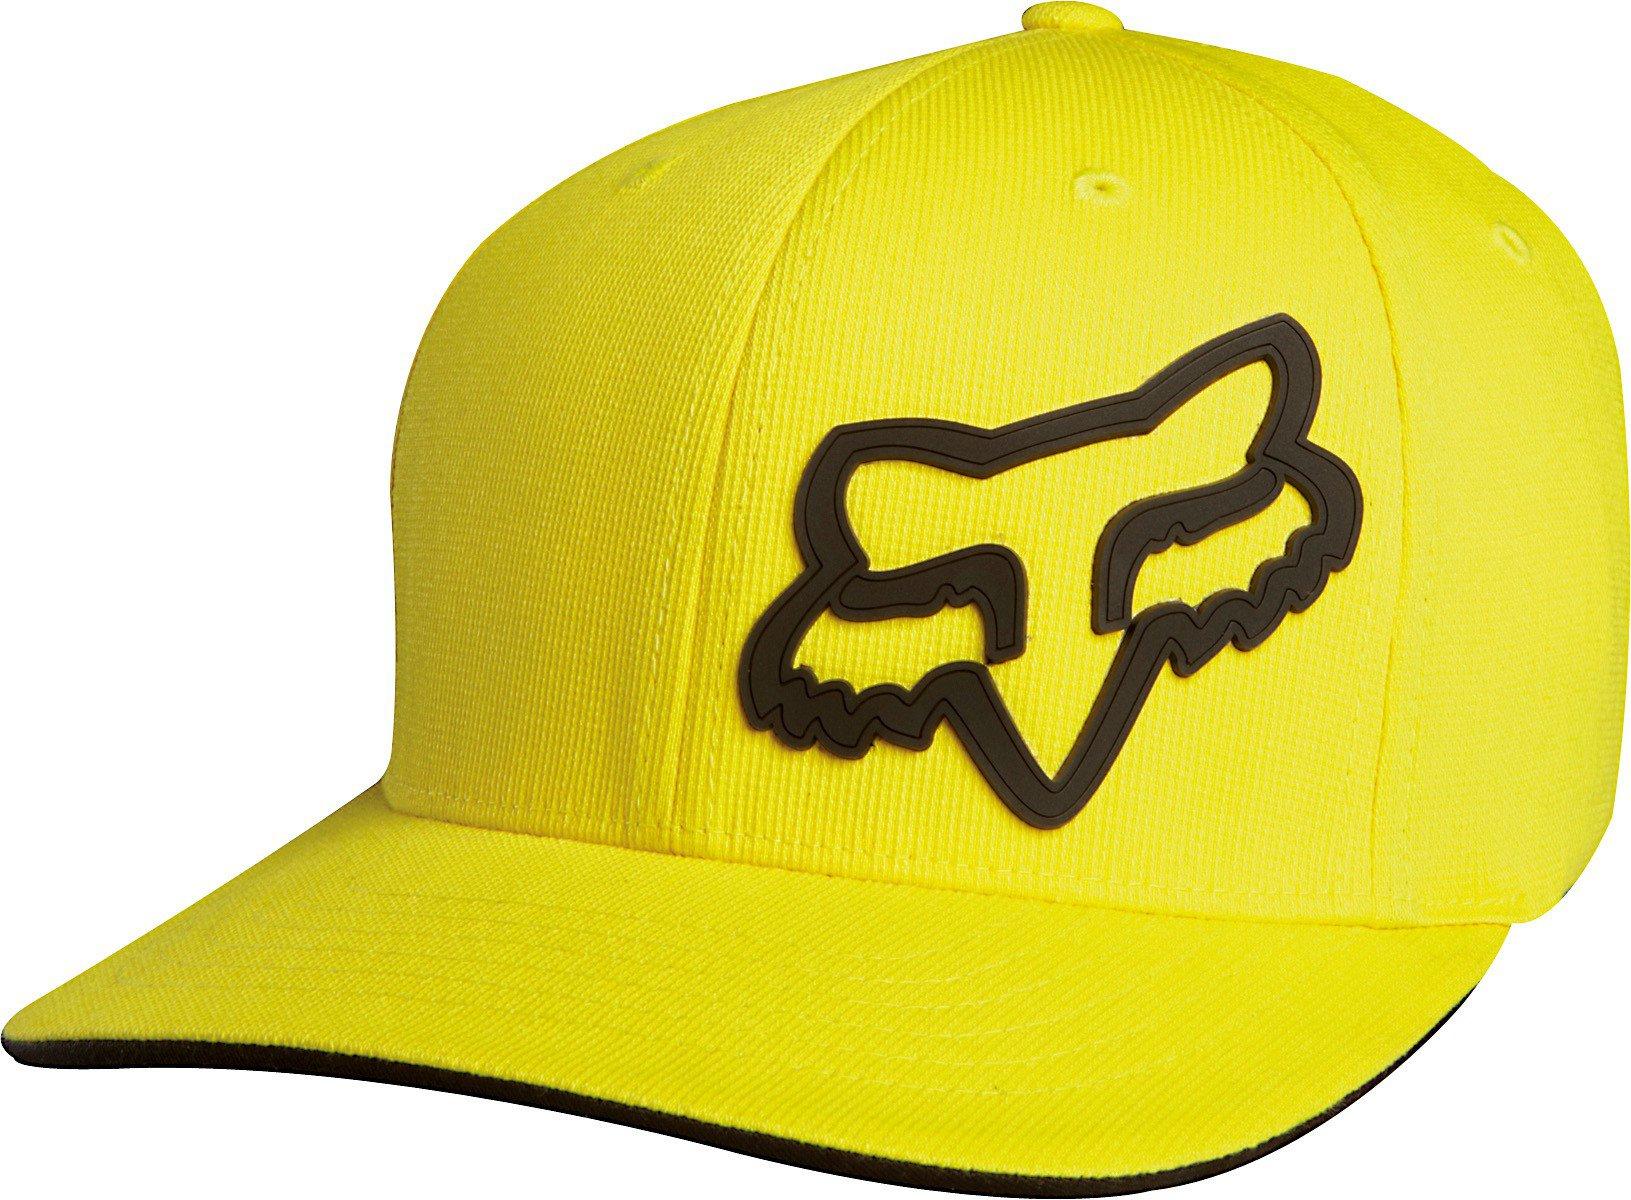 Čepice/Kšiltovka FOX Flexfit Signature žlutá